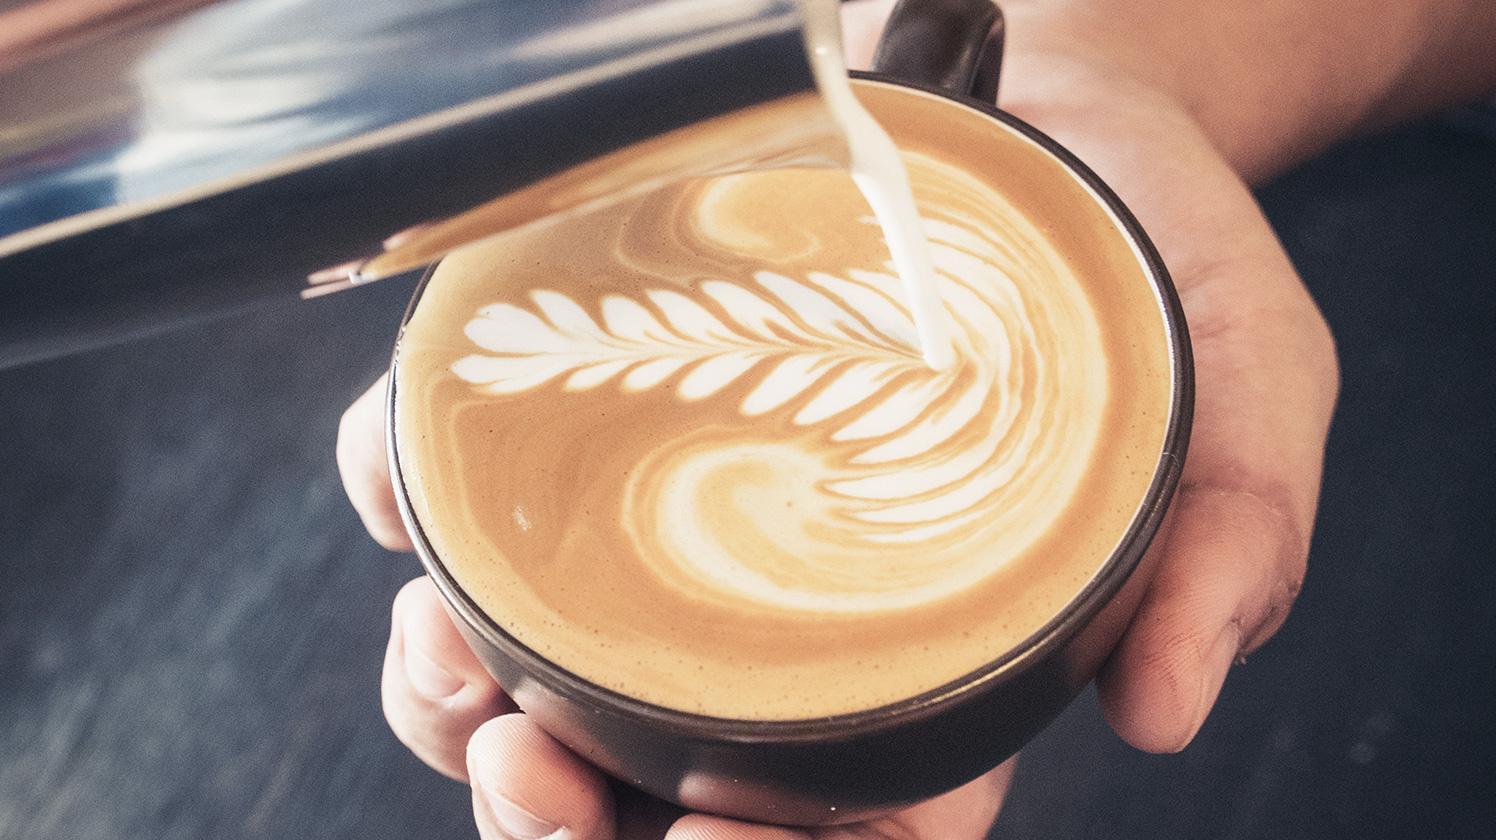 Filtr BRITA AquaAroma kawa pianka cappuccino